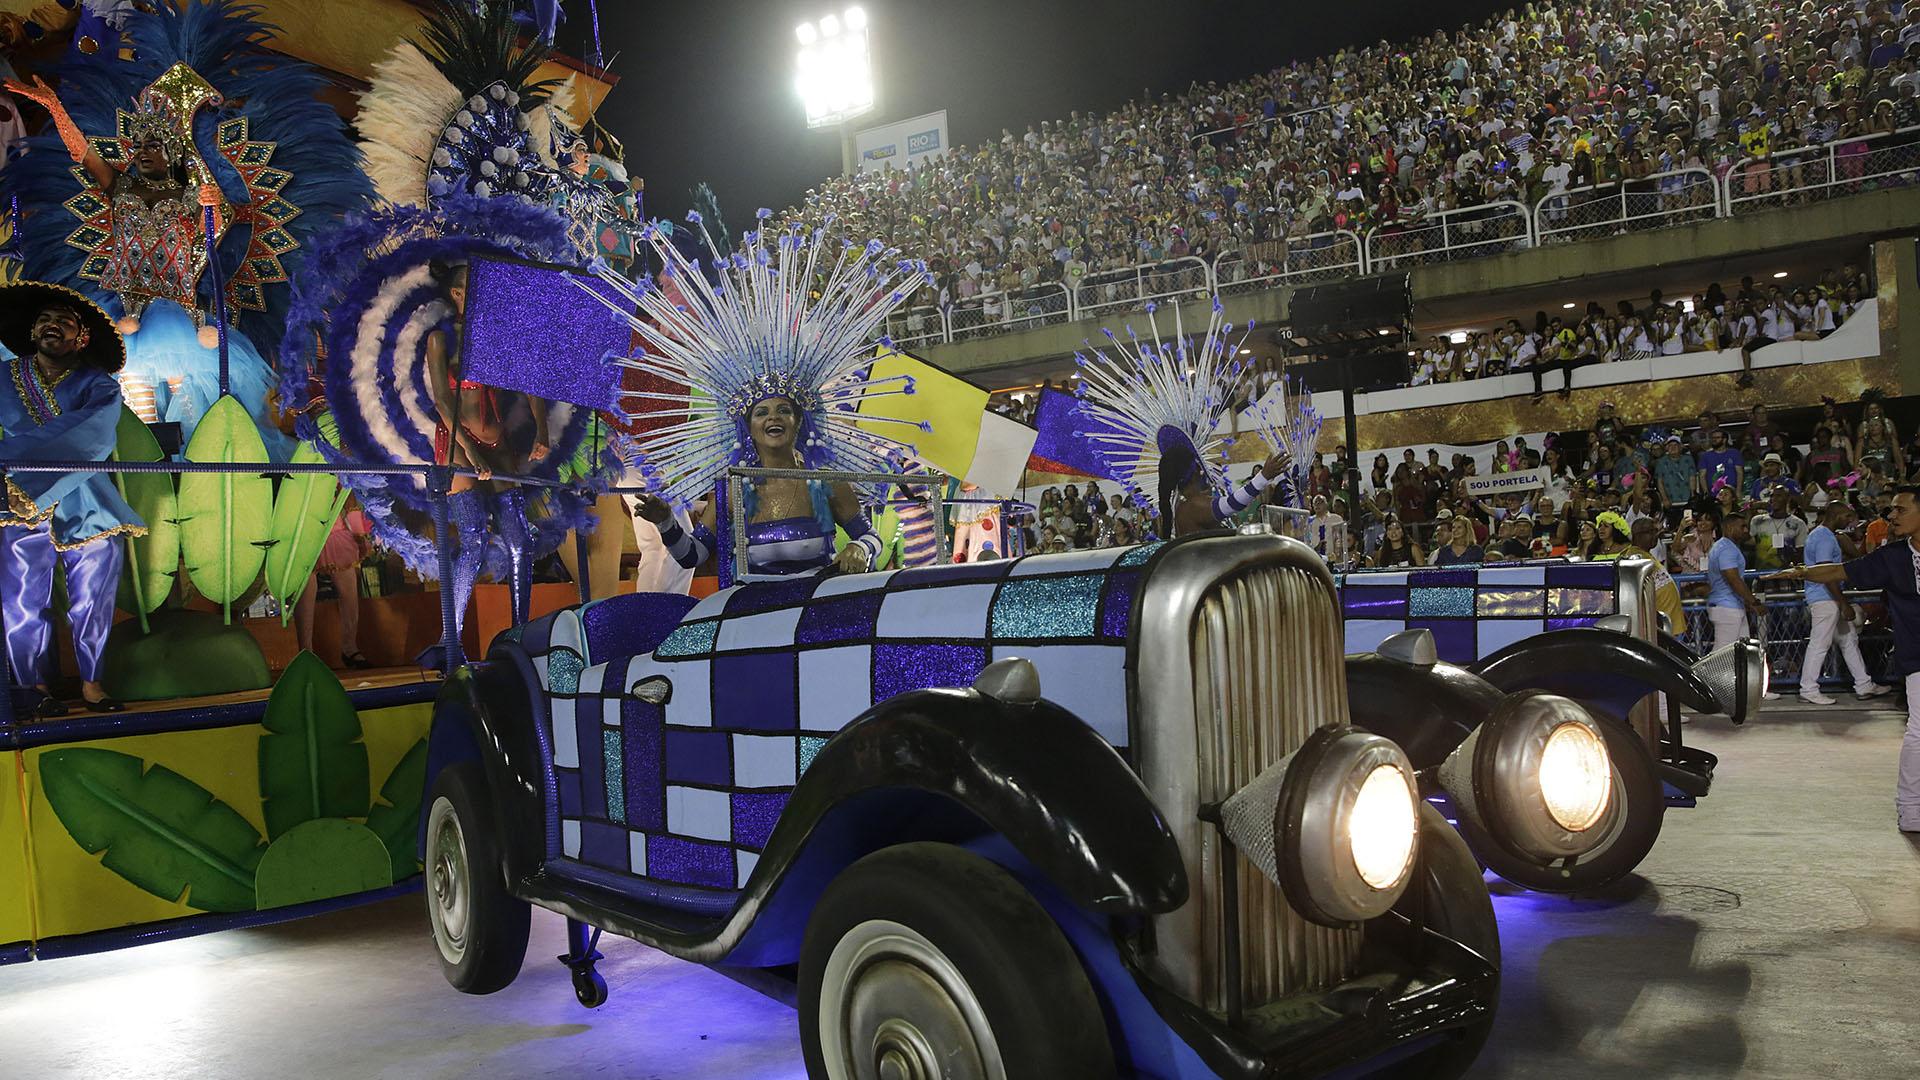 Un auto, la imagen elegida por la escuela Portela(AP Photo/Silvia Izquierdo)